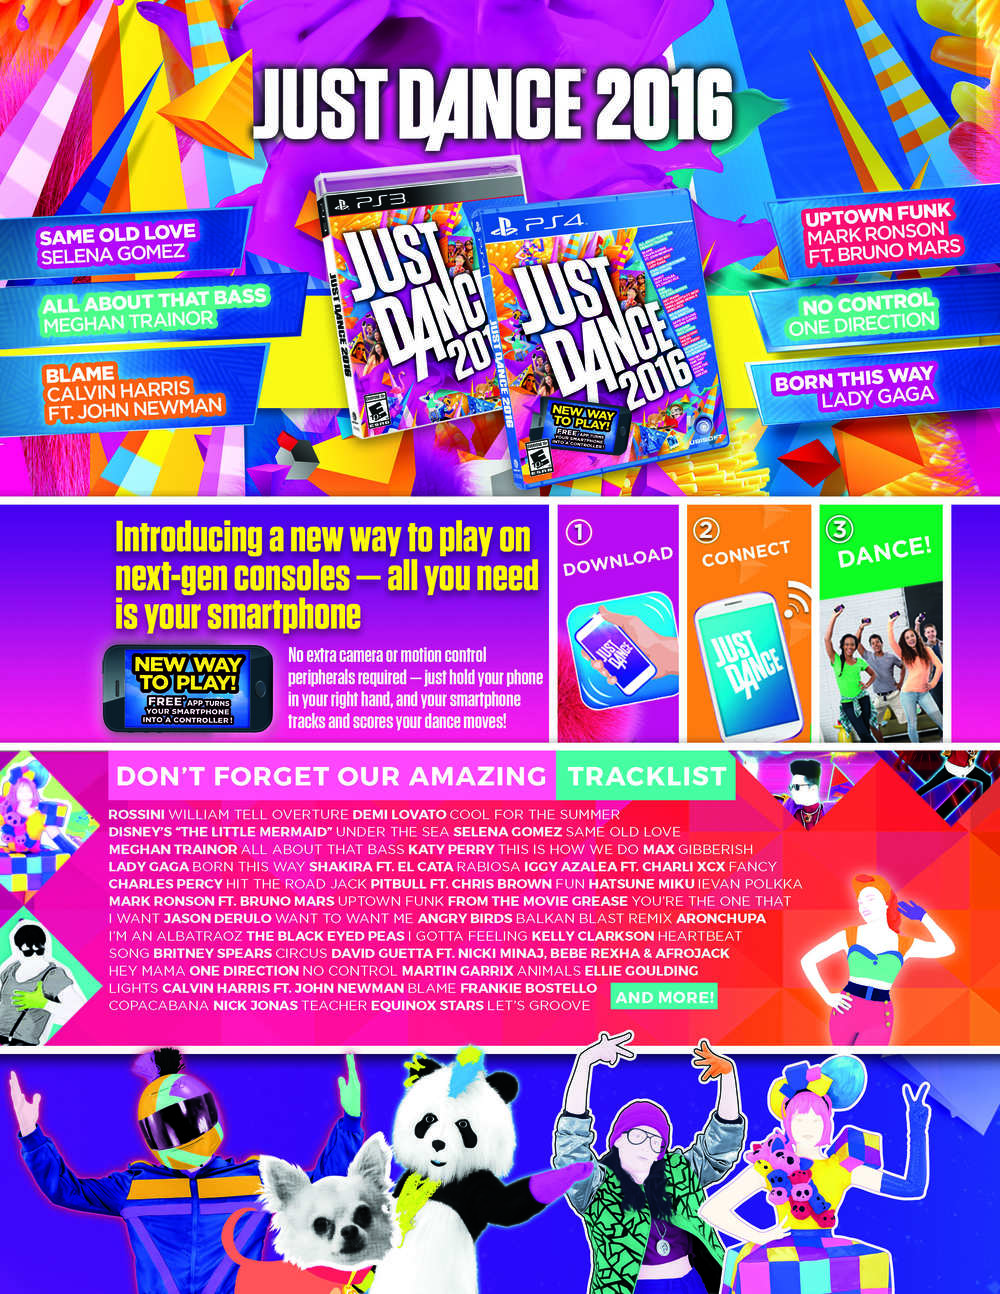 Just Dance 2016 Infosheet